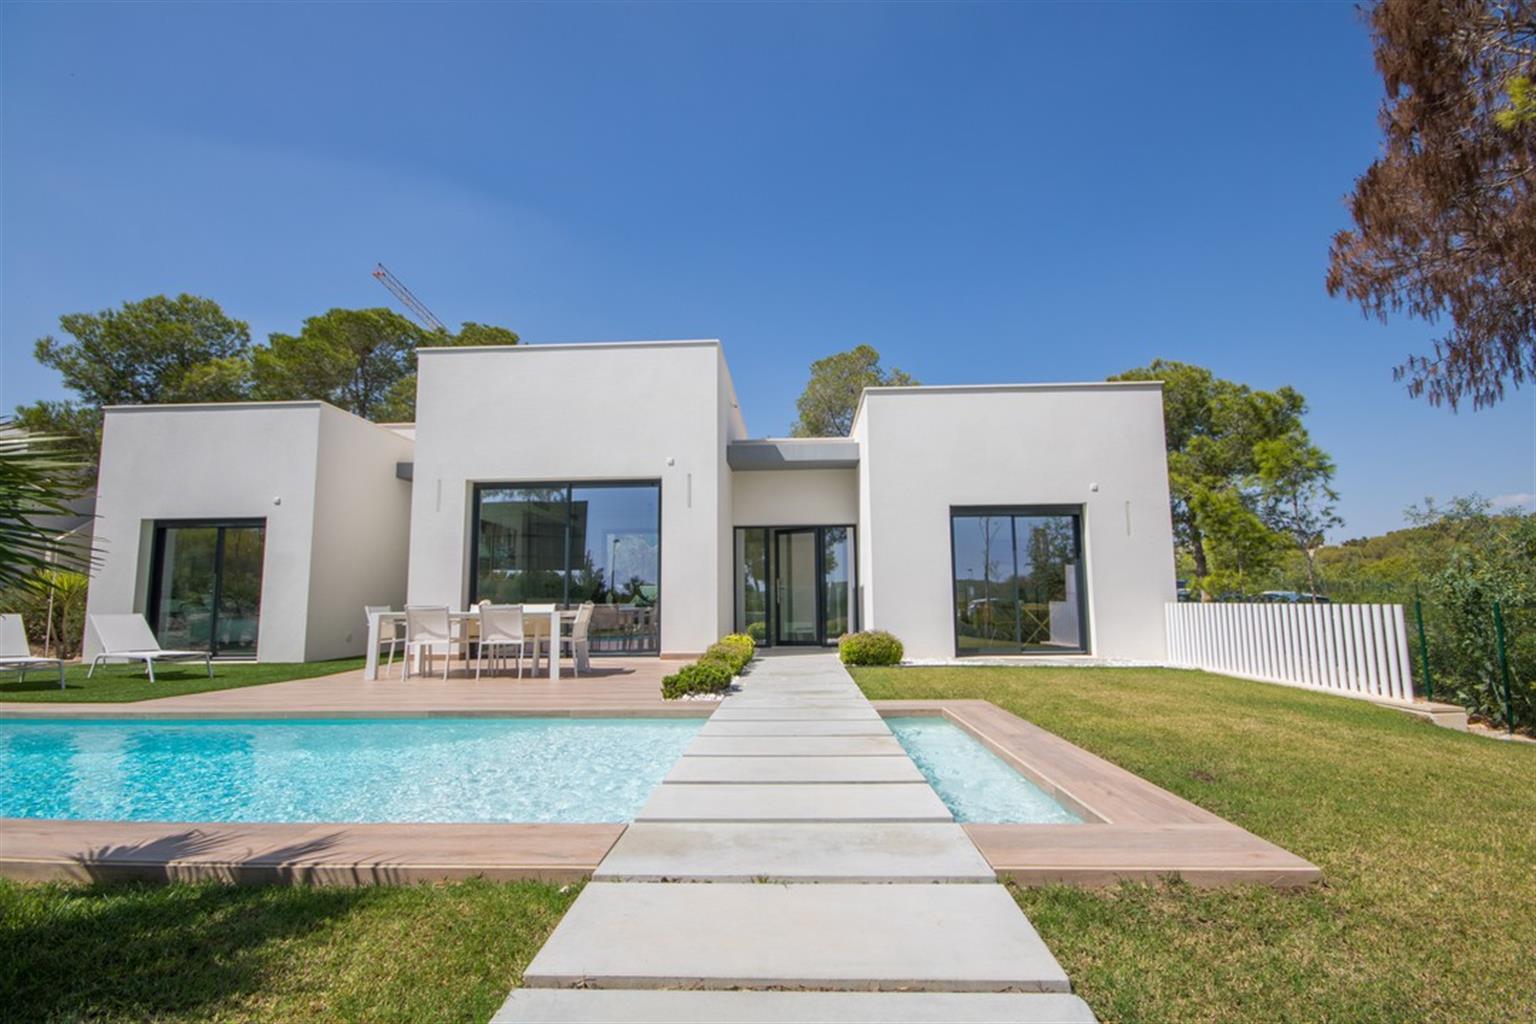 Maison - Villamartin - #4228155-26